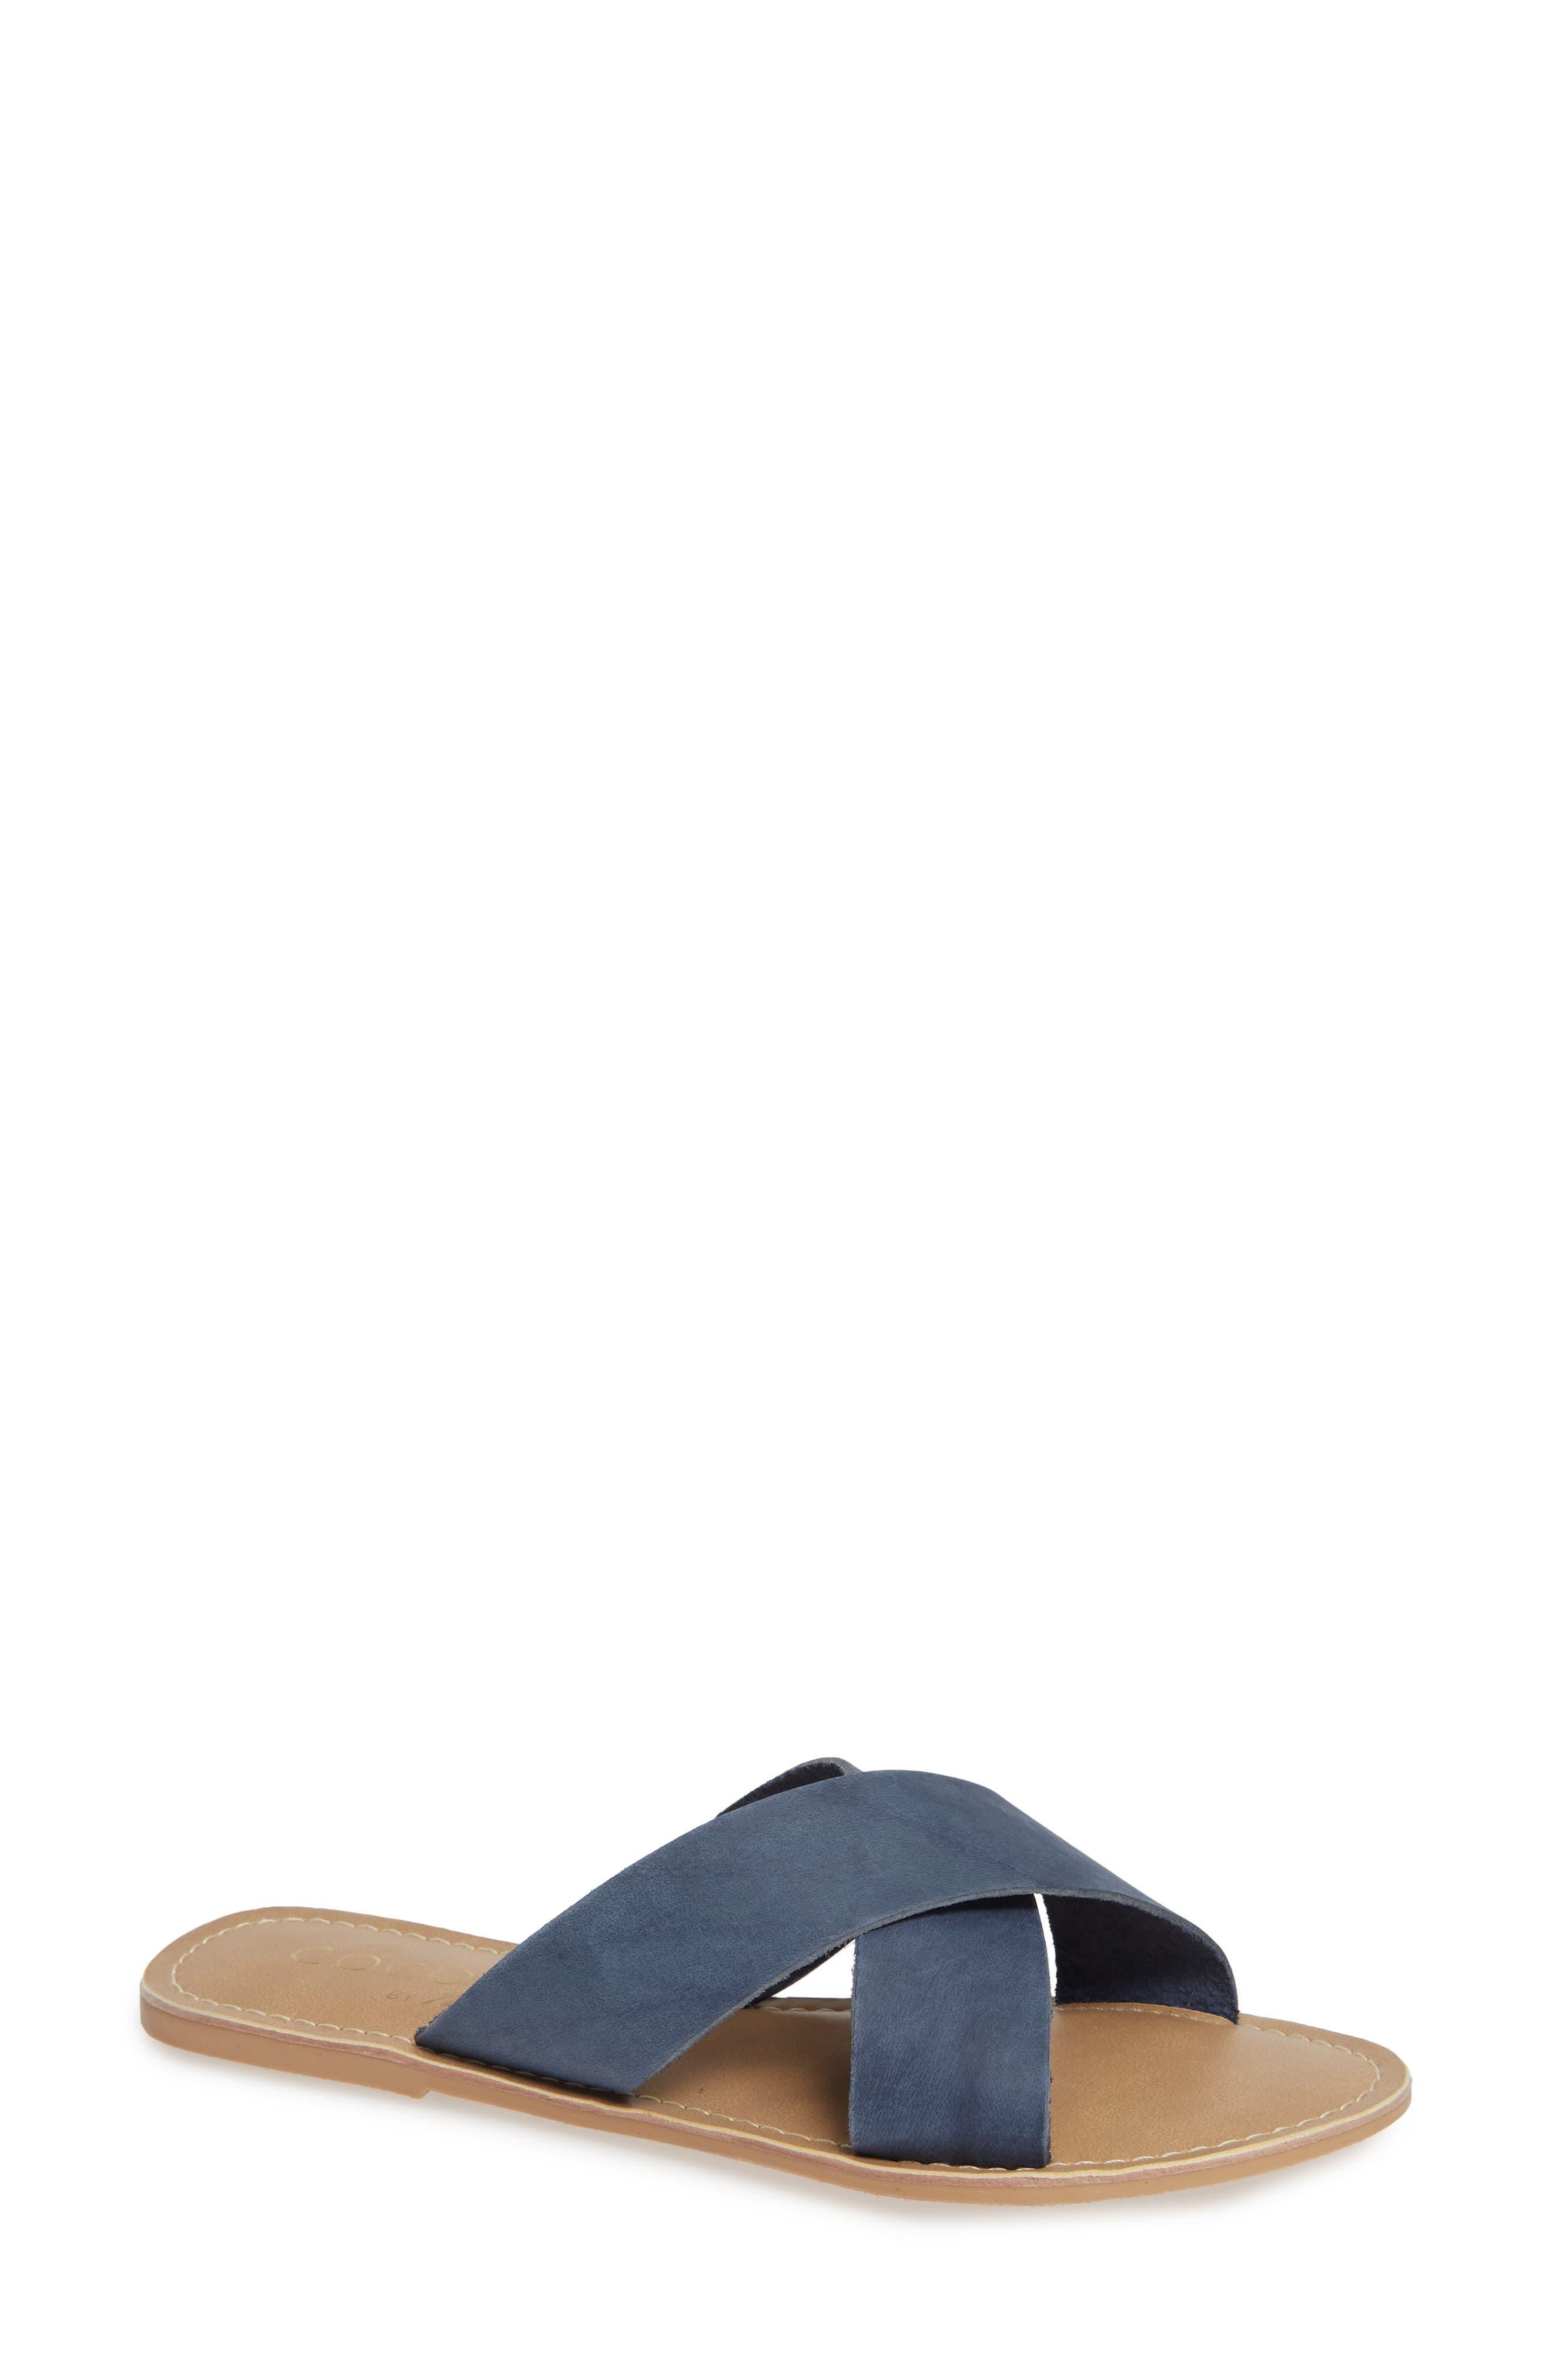 COCONUTS BY MATISSE Pebble Slide Sandal, Main, color, BLUE NUBUCK LEATHER